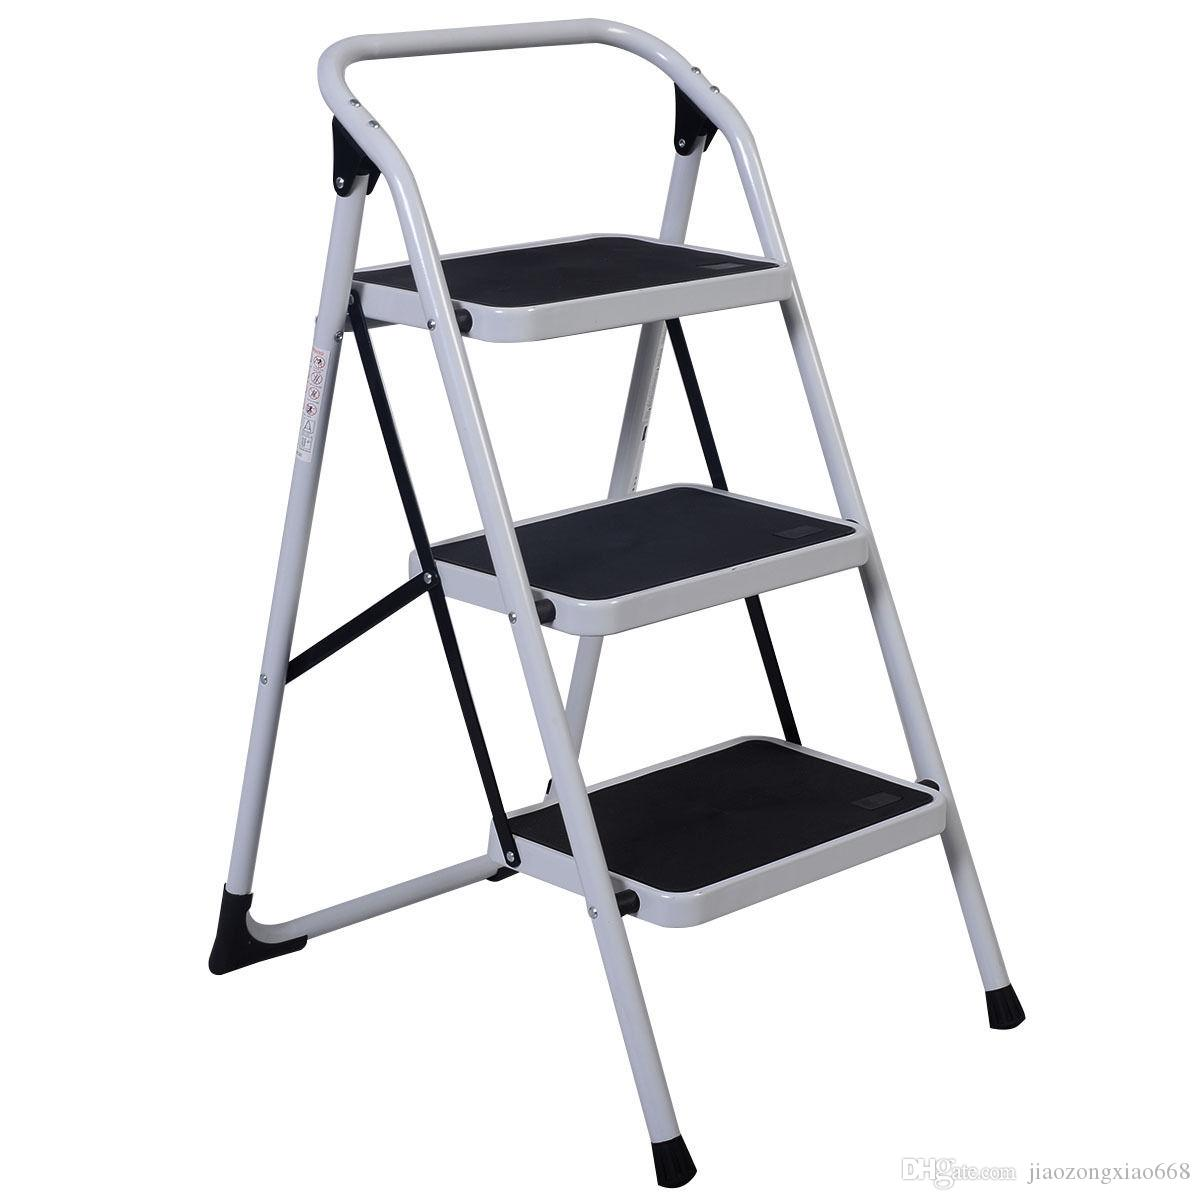 Best 3 Step Ladder Folding Non Slip Safety Tread Heavy